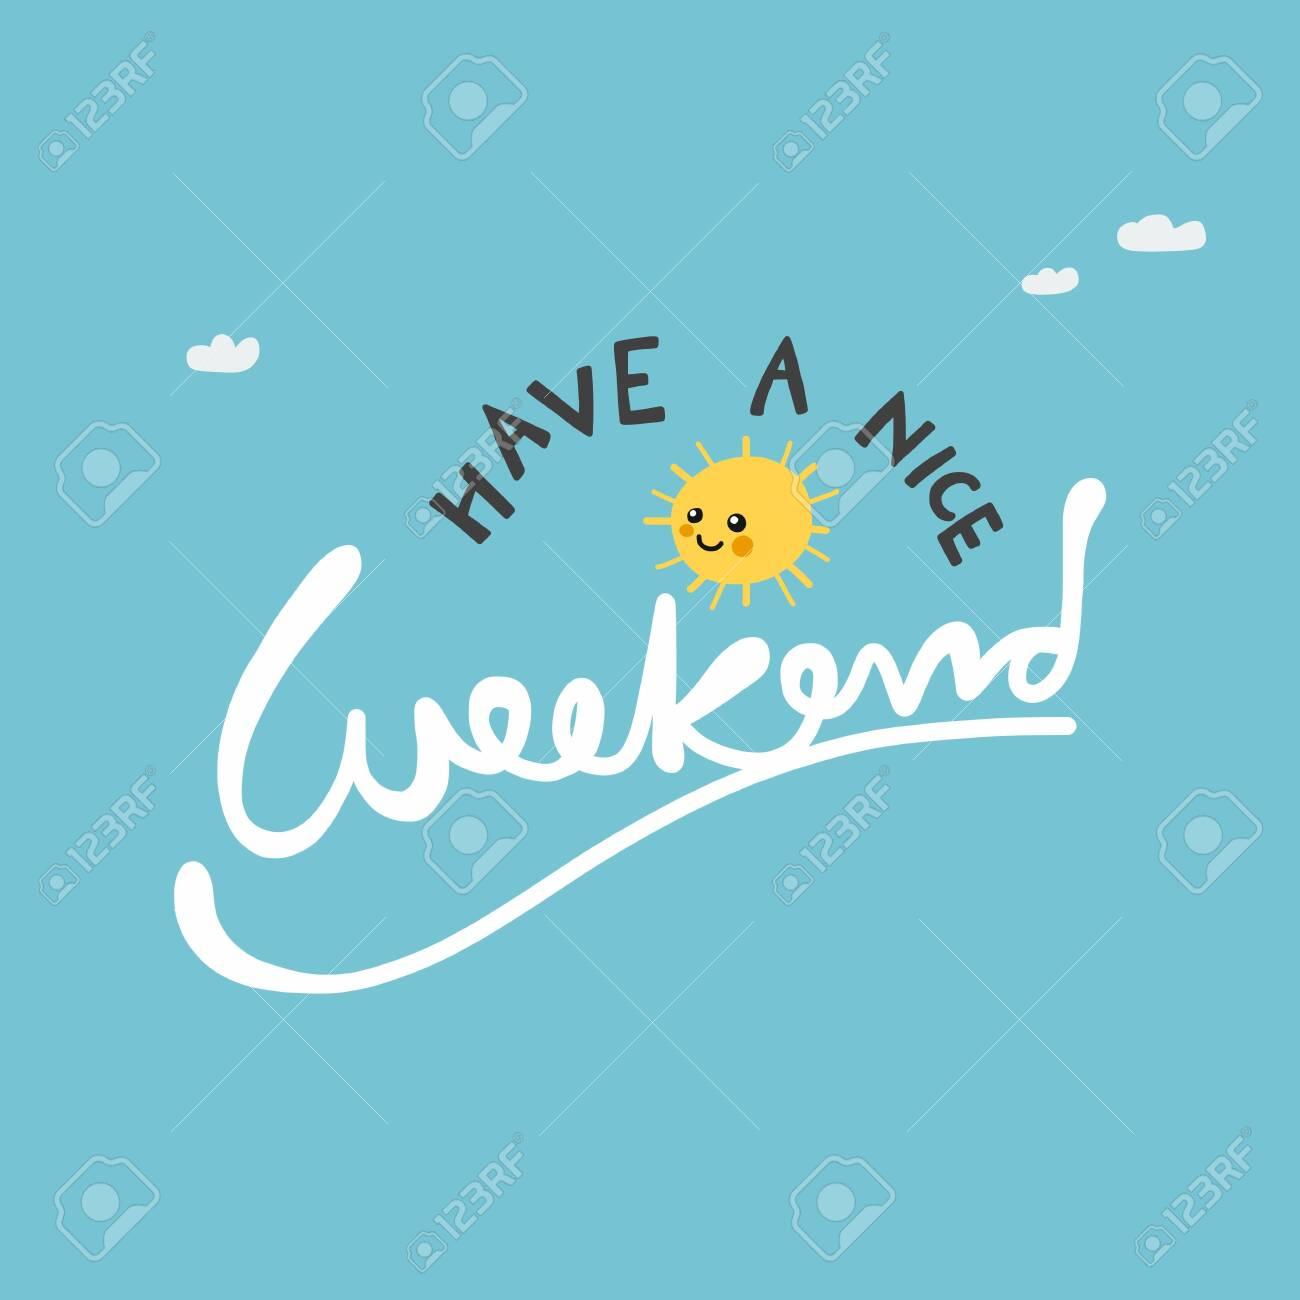 Have a nice weekend cute sun on blue sky vector illustration - 134457392